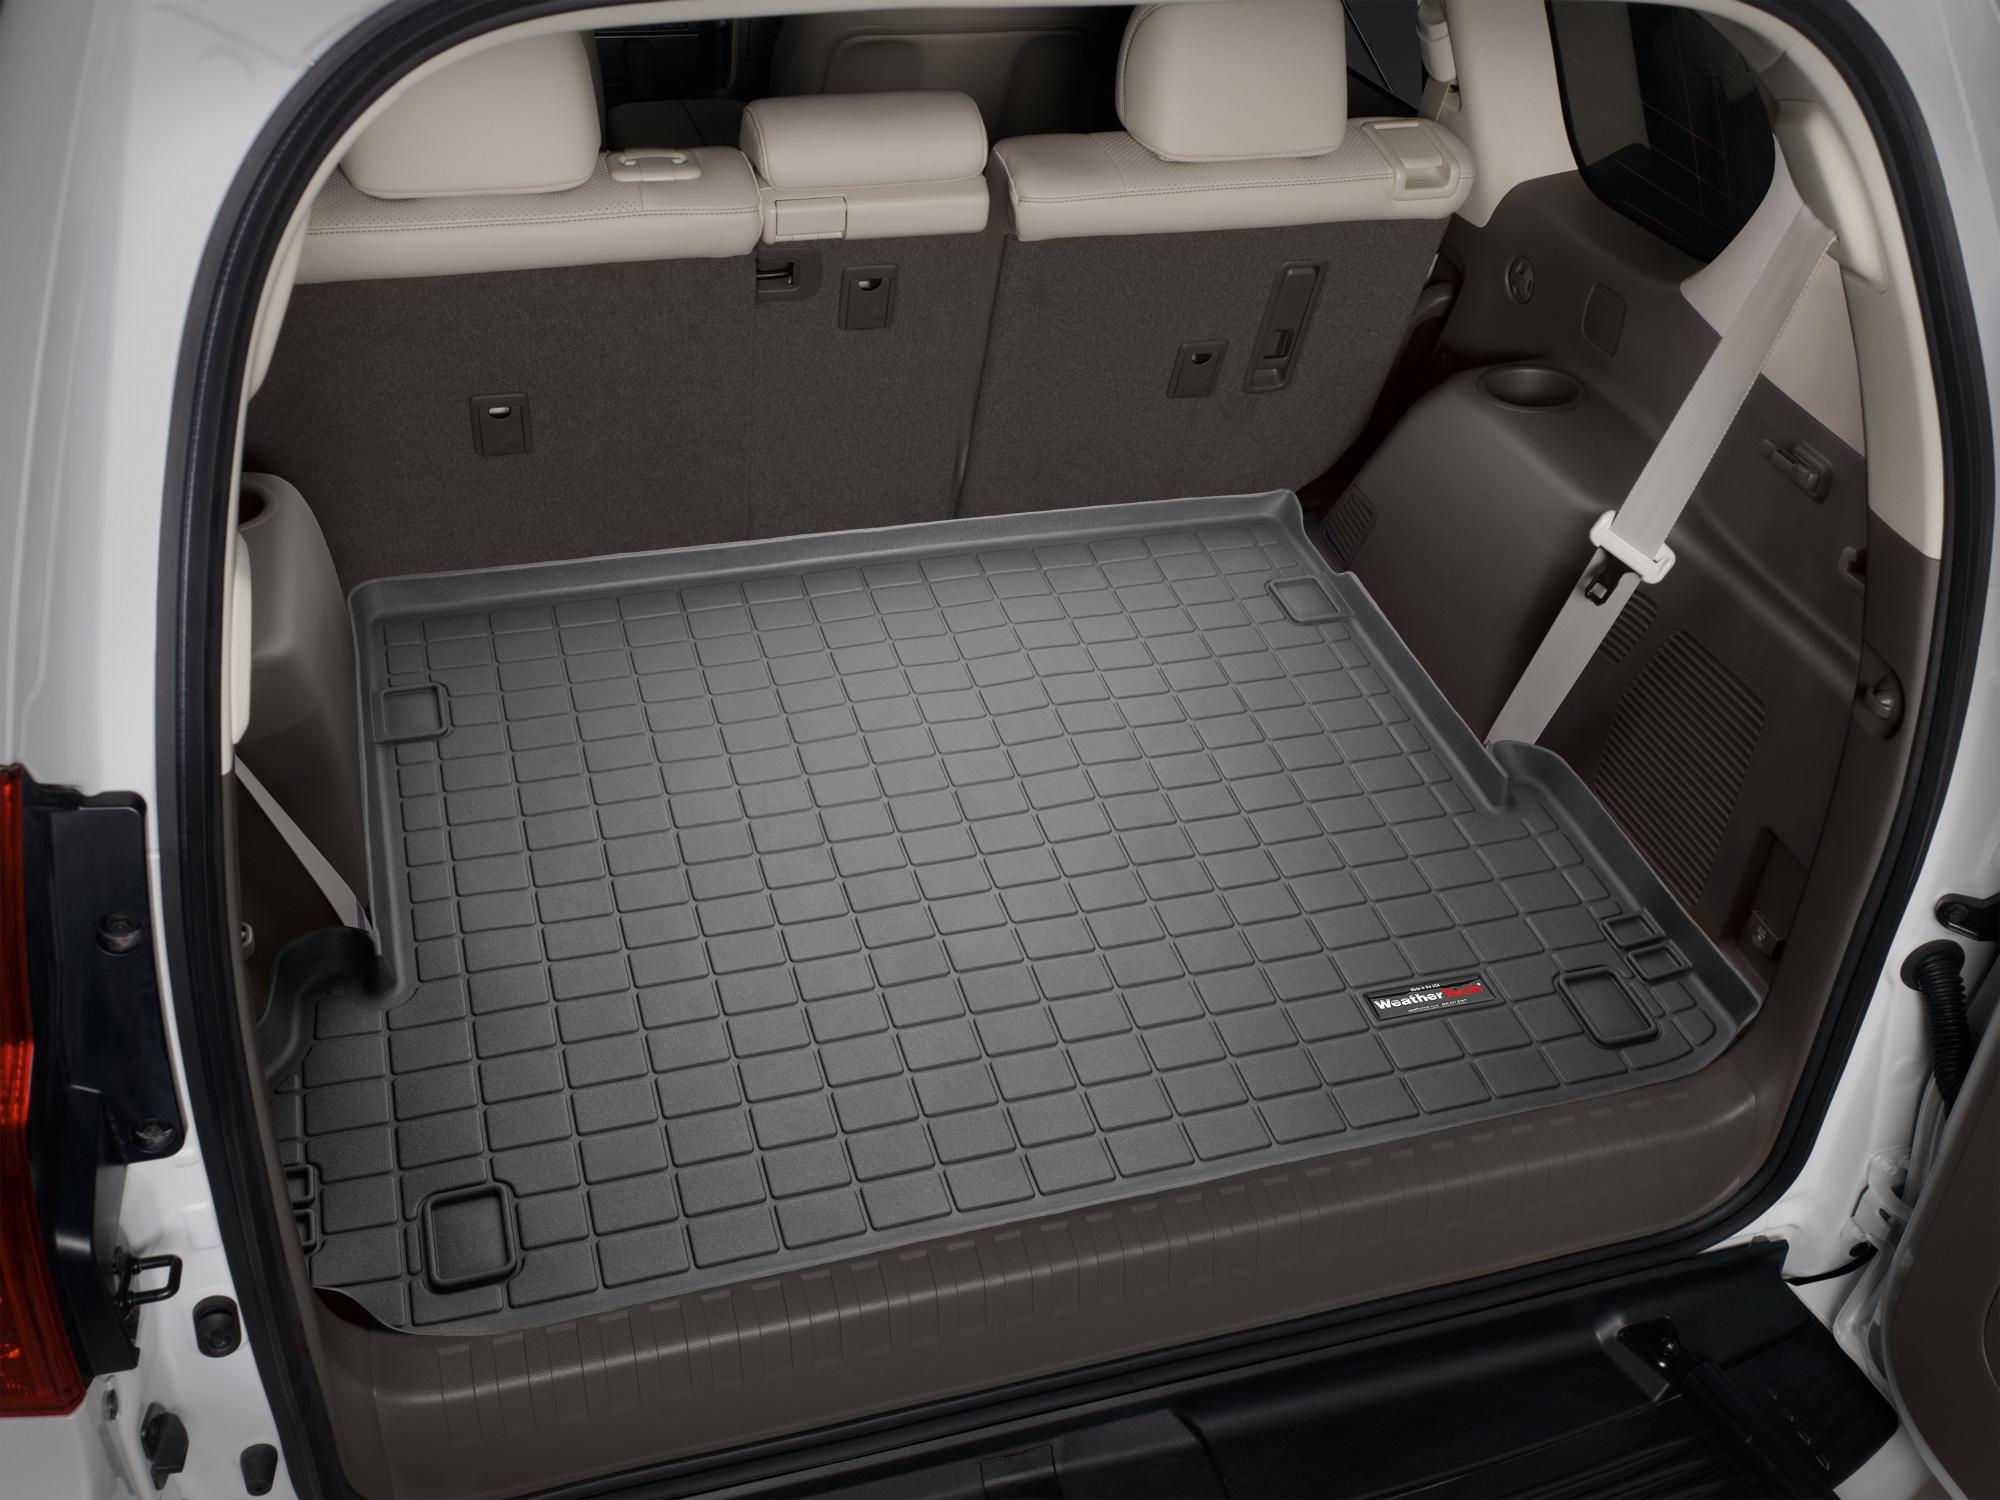 Toyota Land Cruiser 150 2010>2017 Vasca baule tappeto bagagliaio marrone *1242